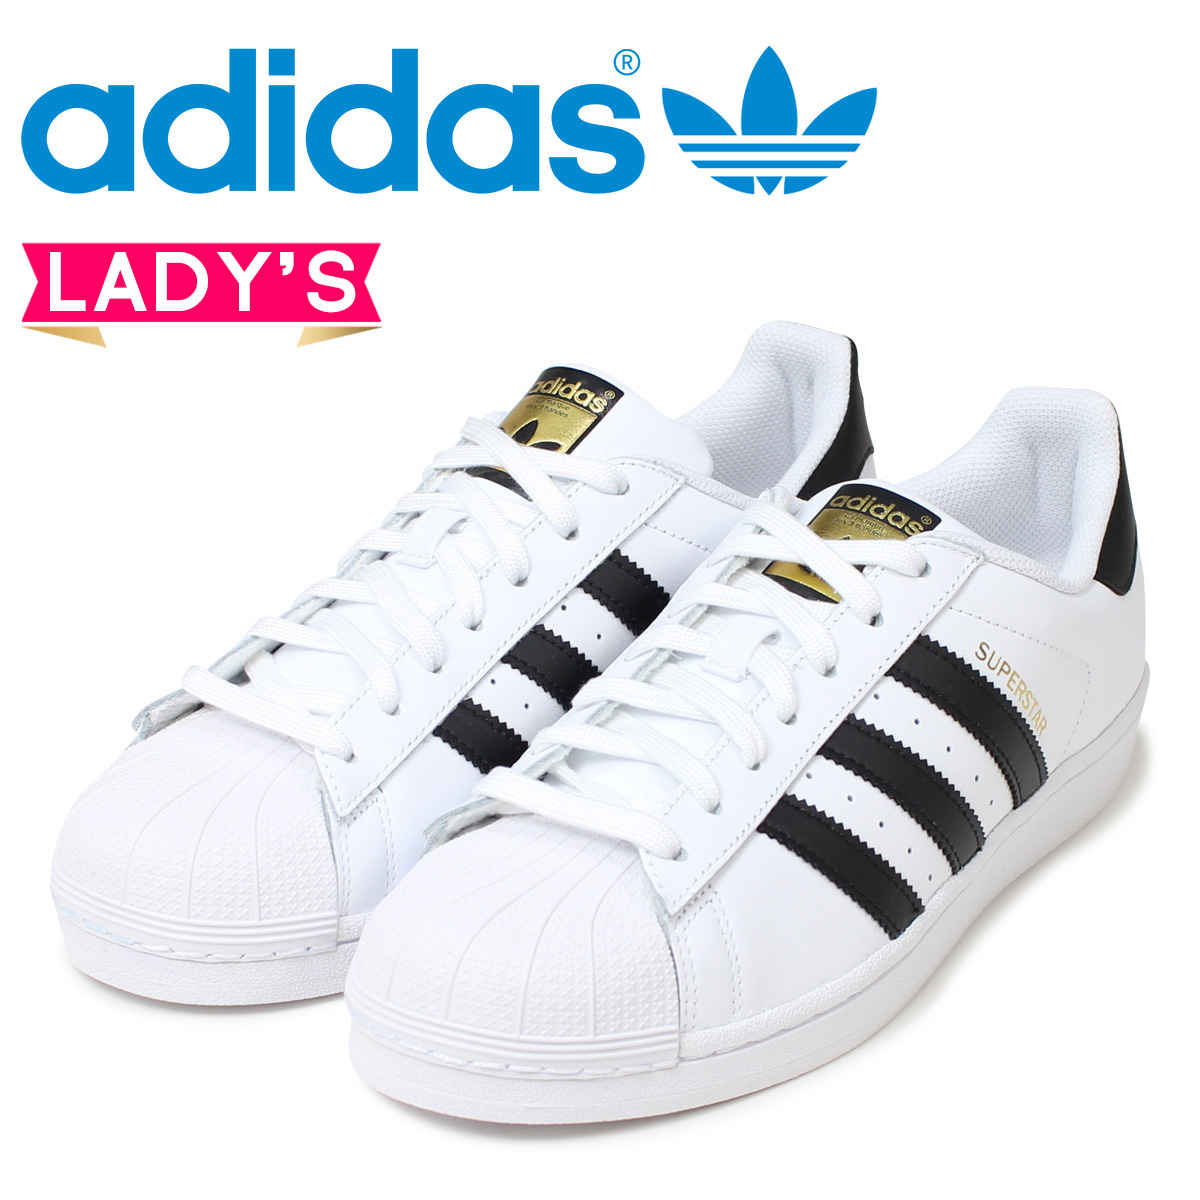 Cost effective Adidas Womens Originals Superstar Shoes